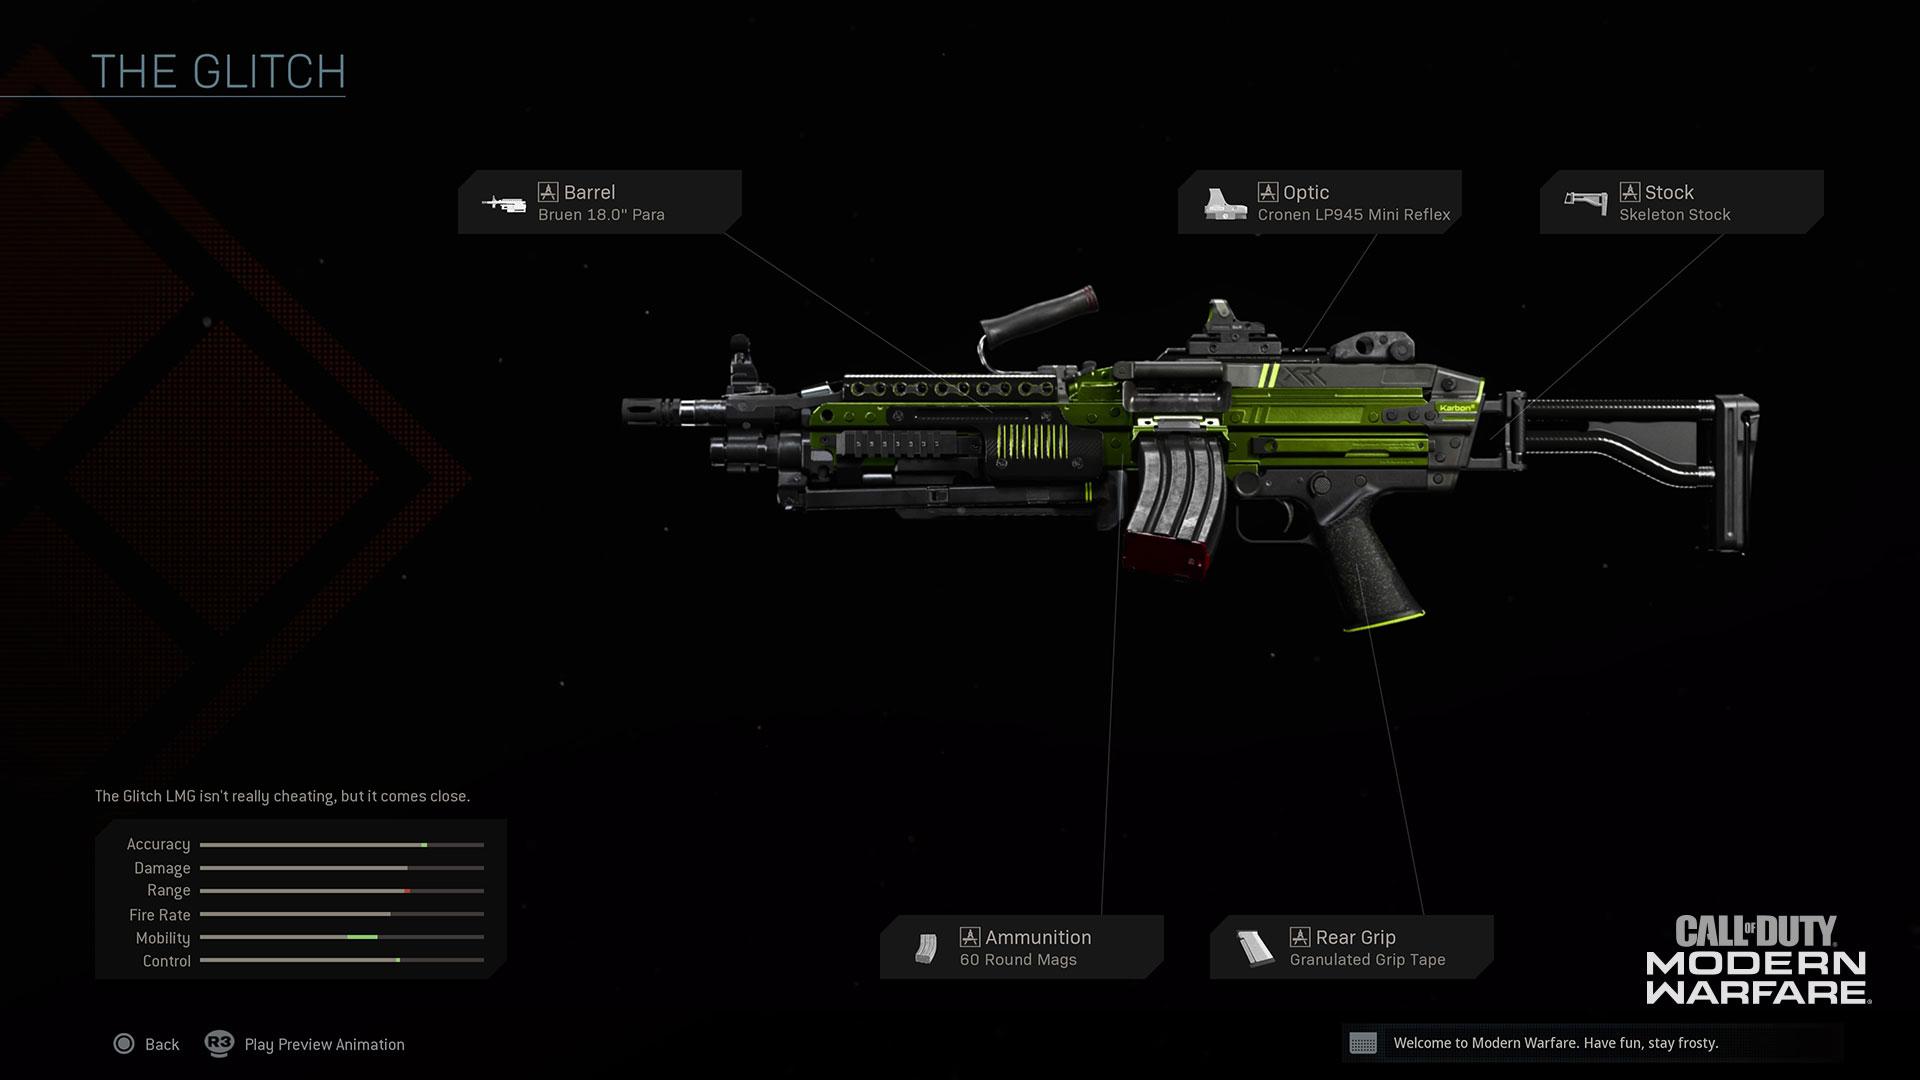 The Bruen MK9: How to Unlock the New LMG in Call of Duty®: Modern Warfare® - Image 1